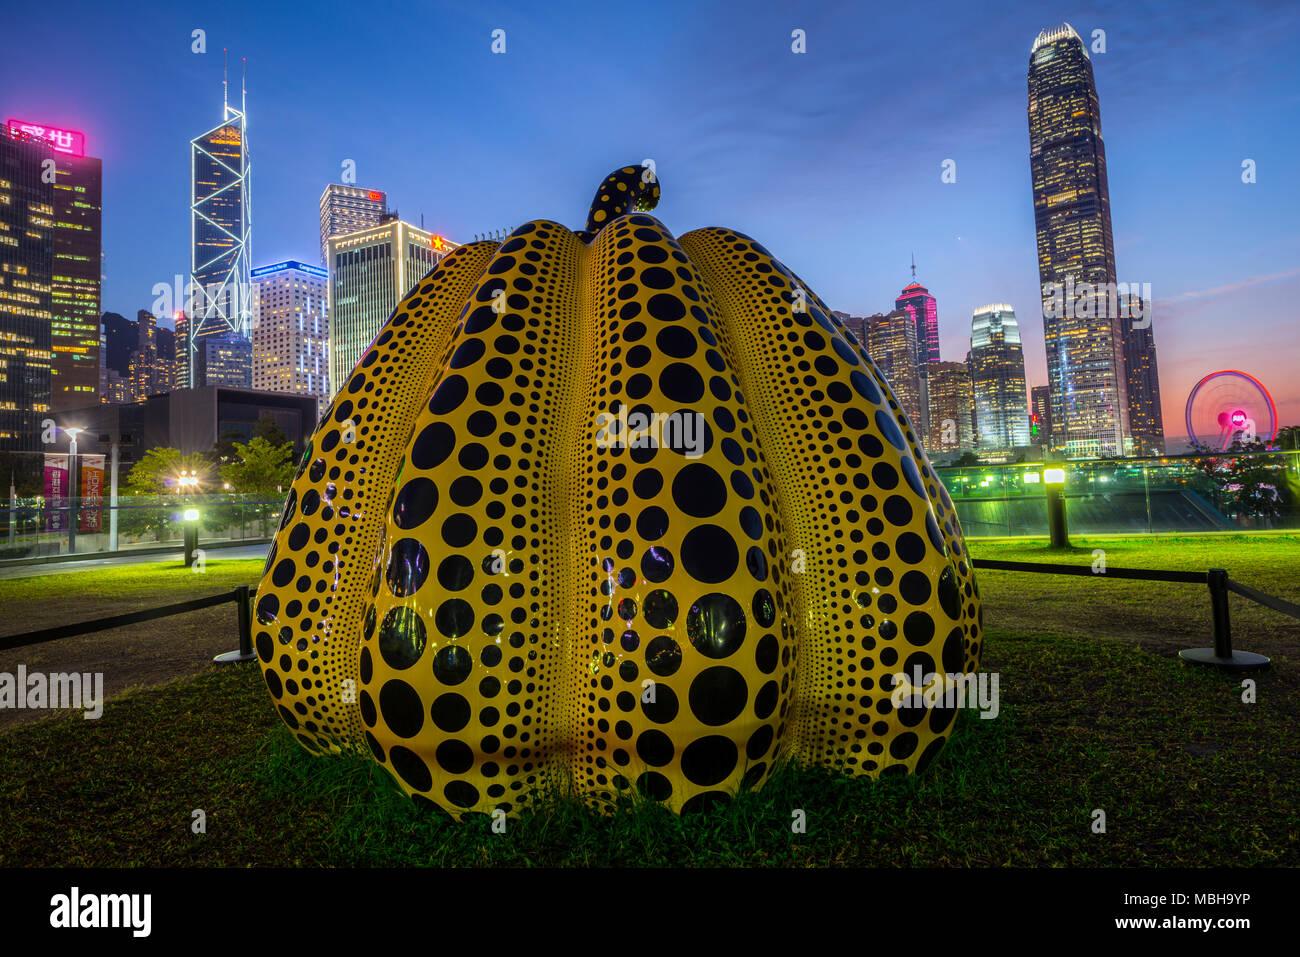 Japanese artists Yayoi Kusama pumpkin at Harbour Arts Sculpture Park, Central district, Hong Kong, China. - Stock Image